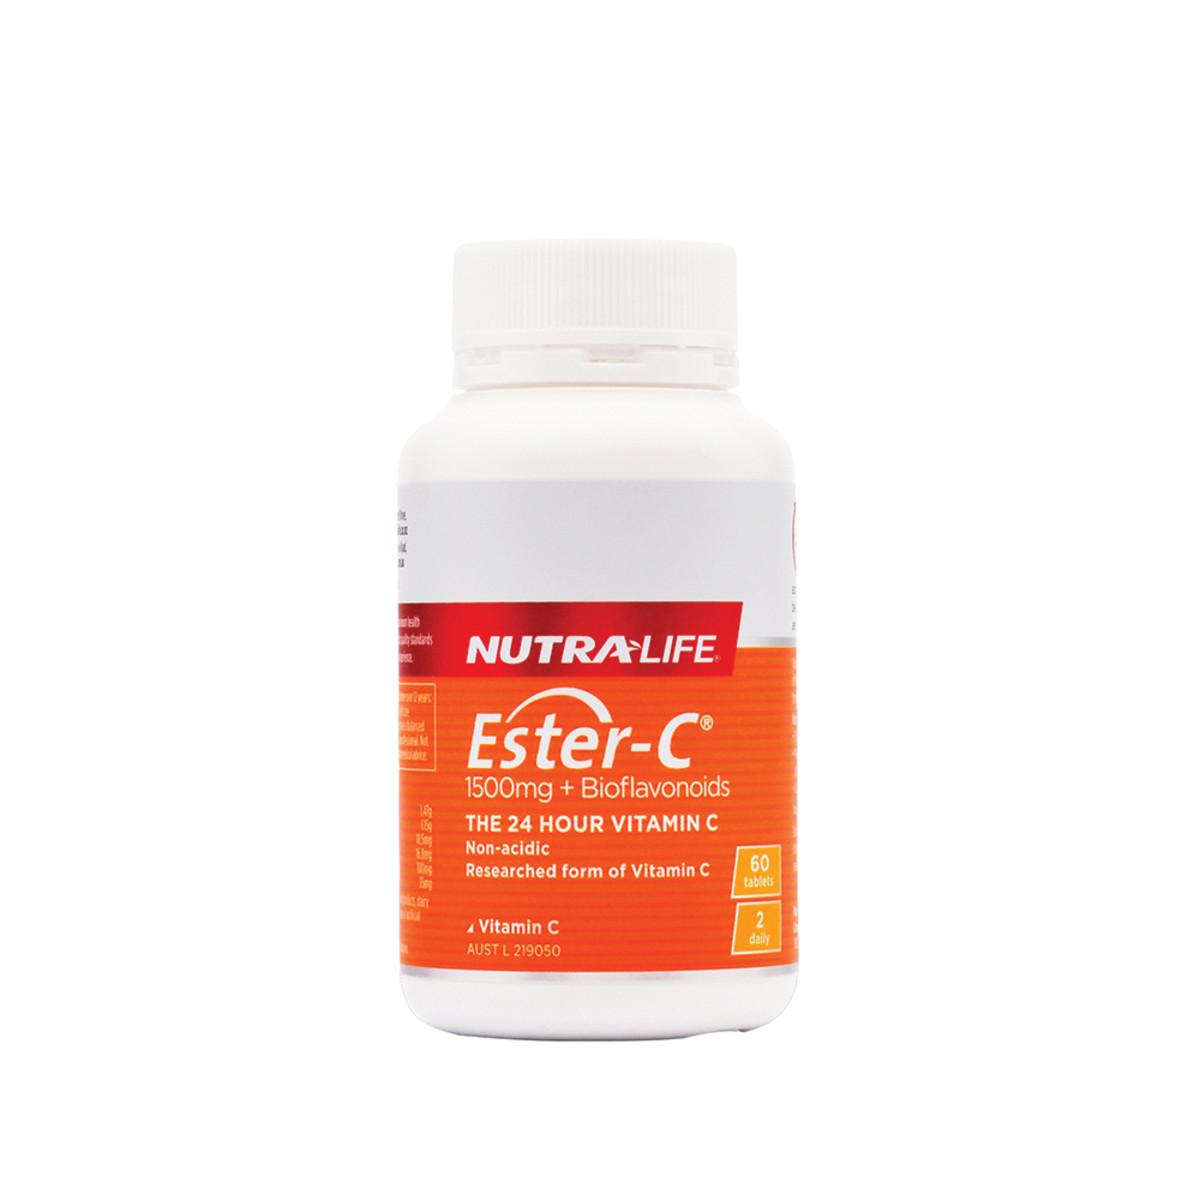 NutraLife Ester-C 1500mg + Bioflavonoids 60t